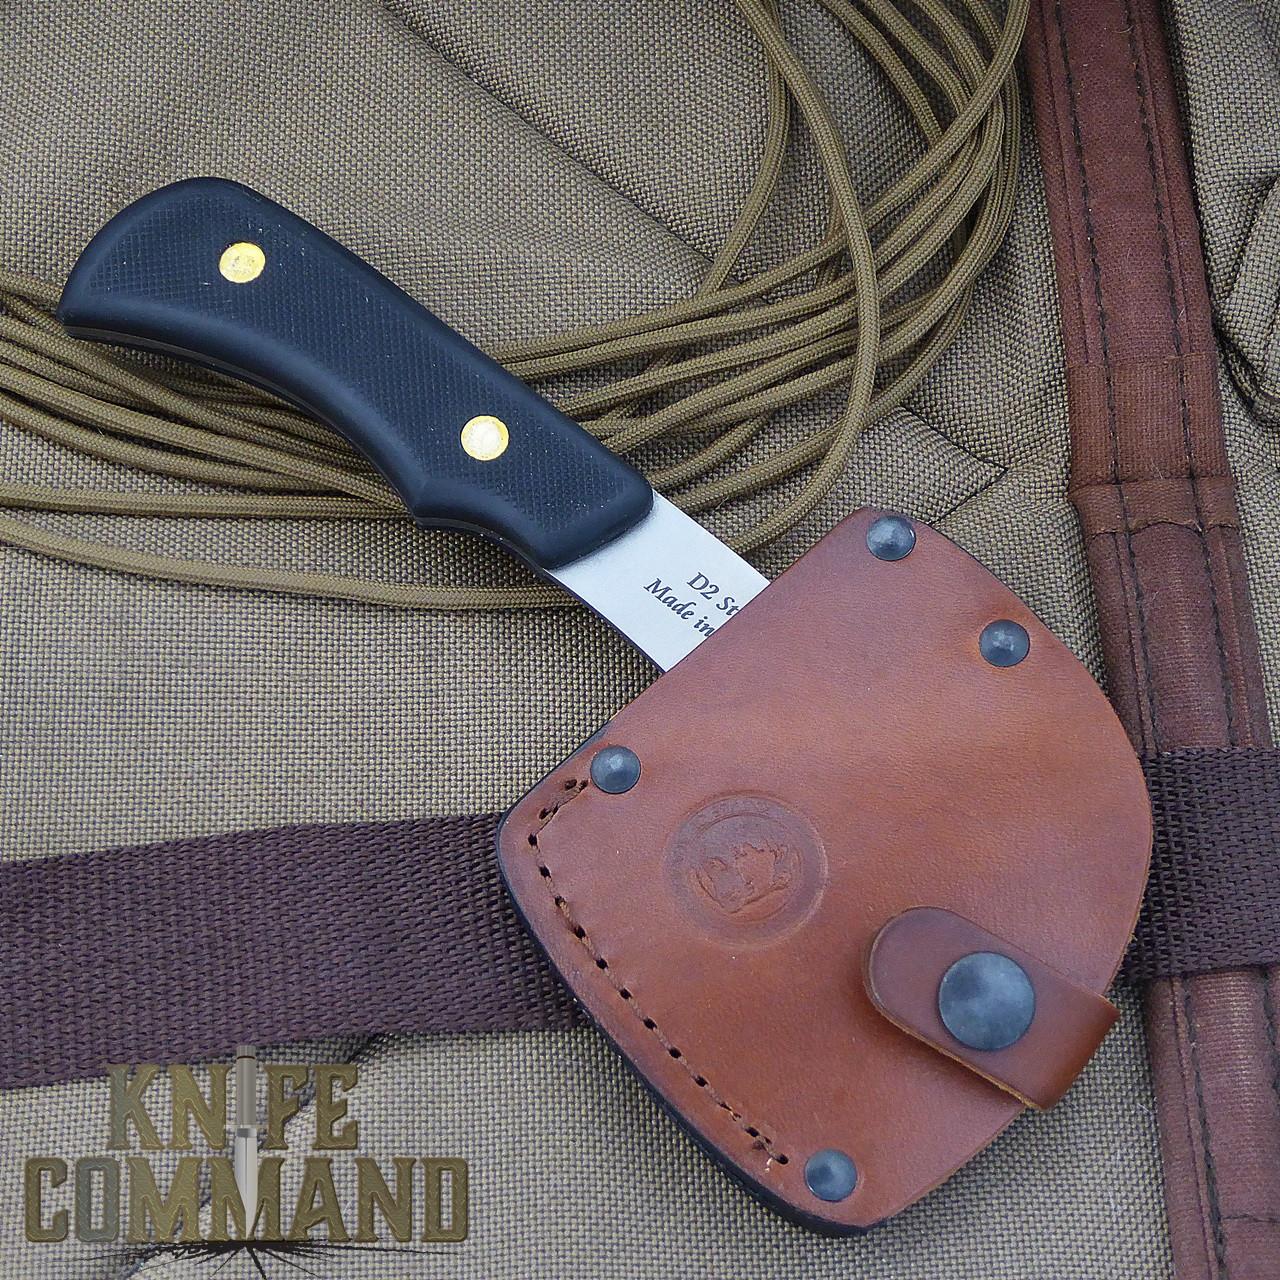 Knives of Alaska Bobcat Mini Hatchet 00960FG.  Custom leather sheath.